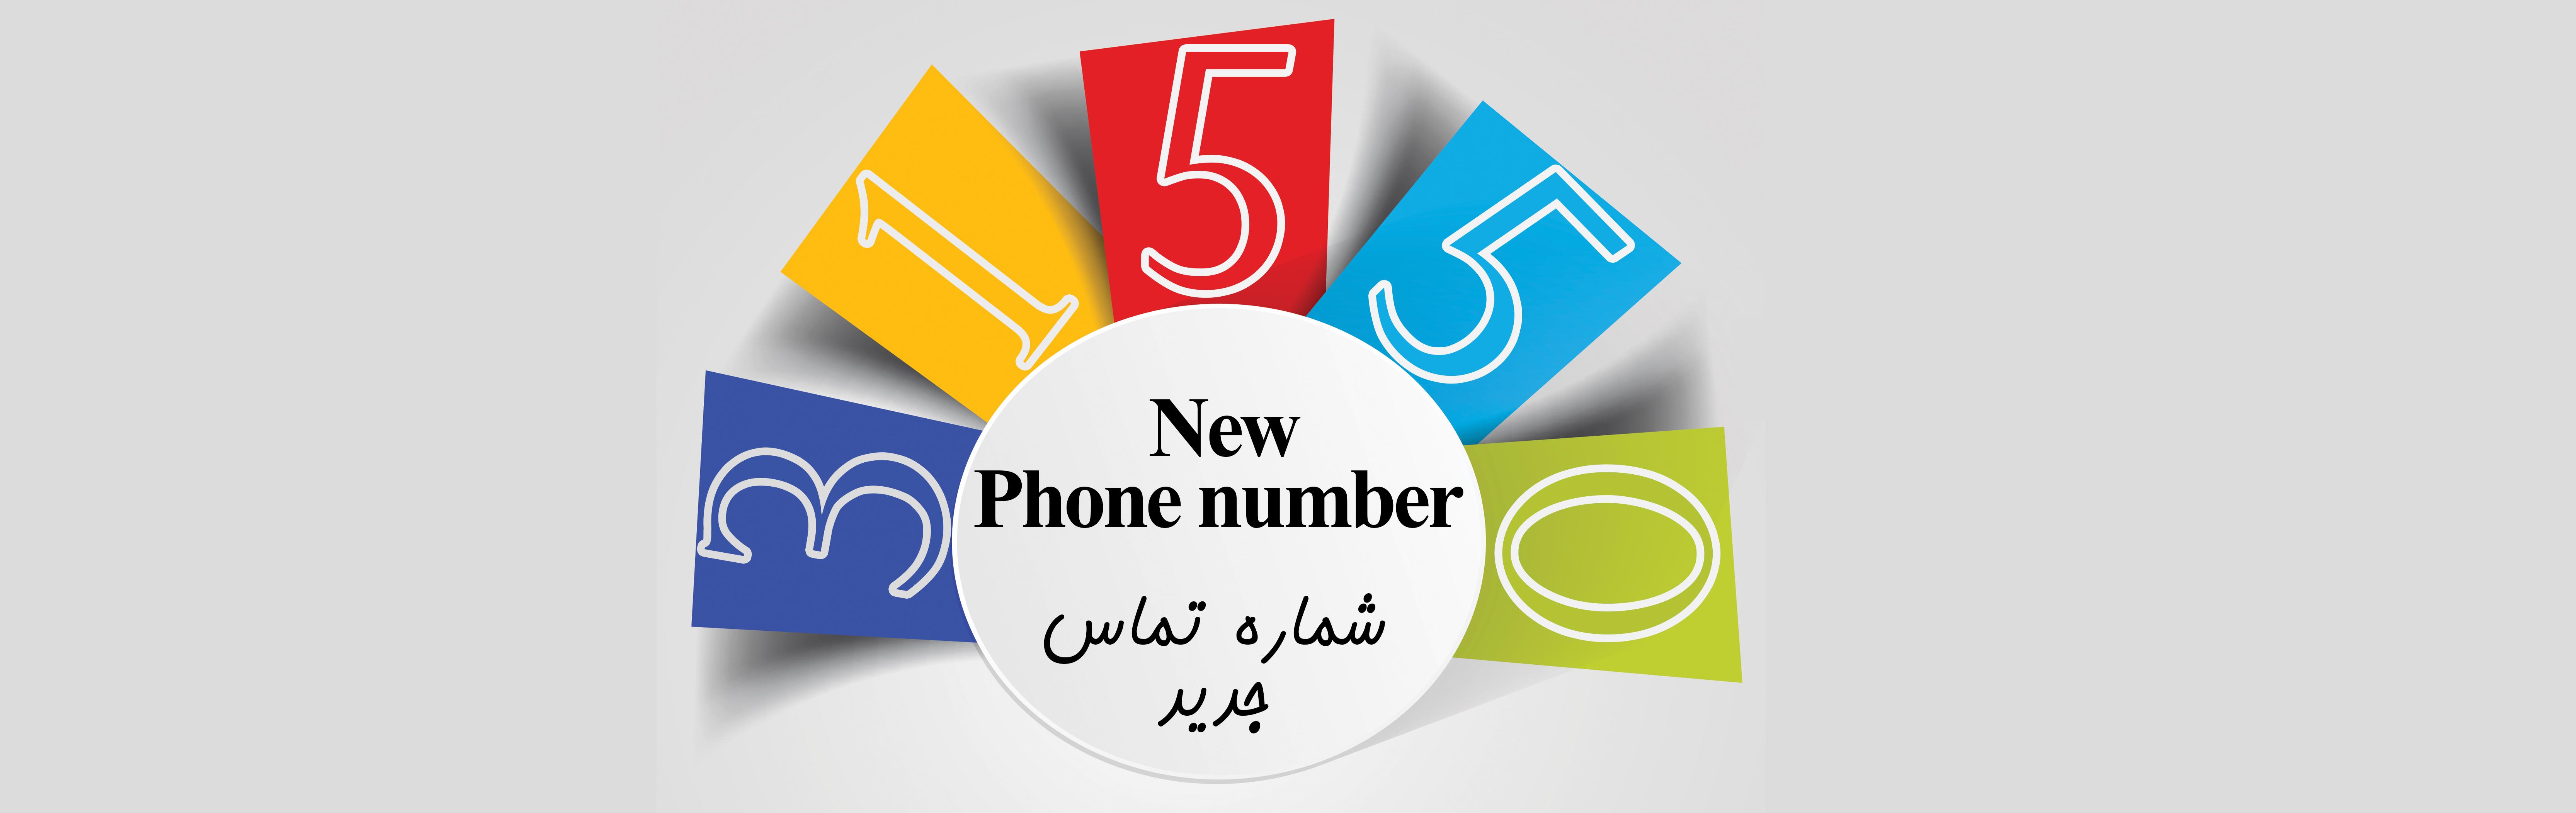 new-call